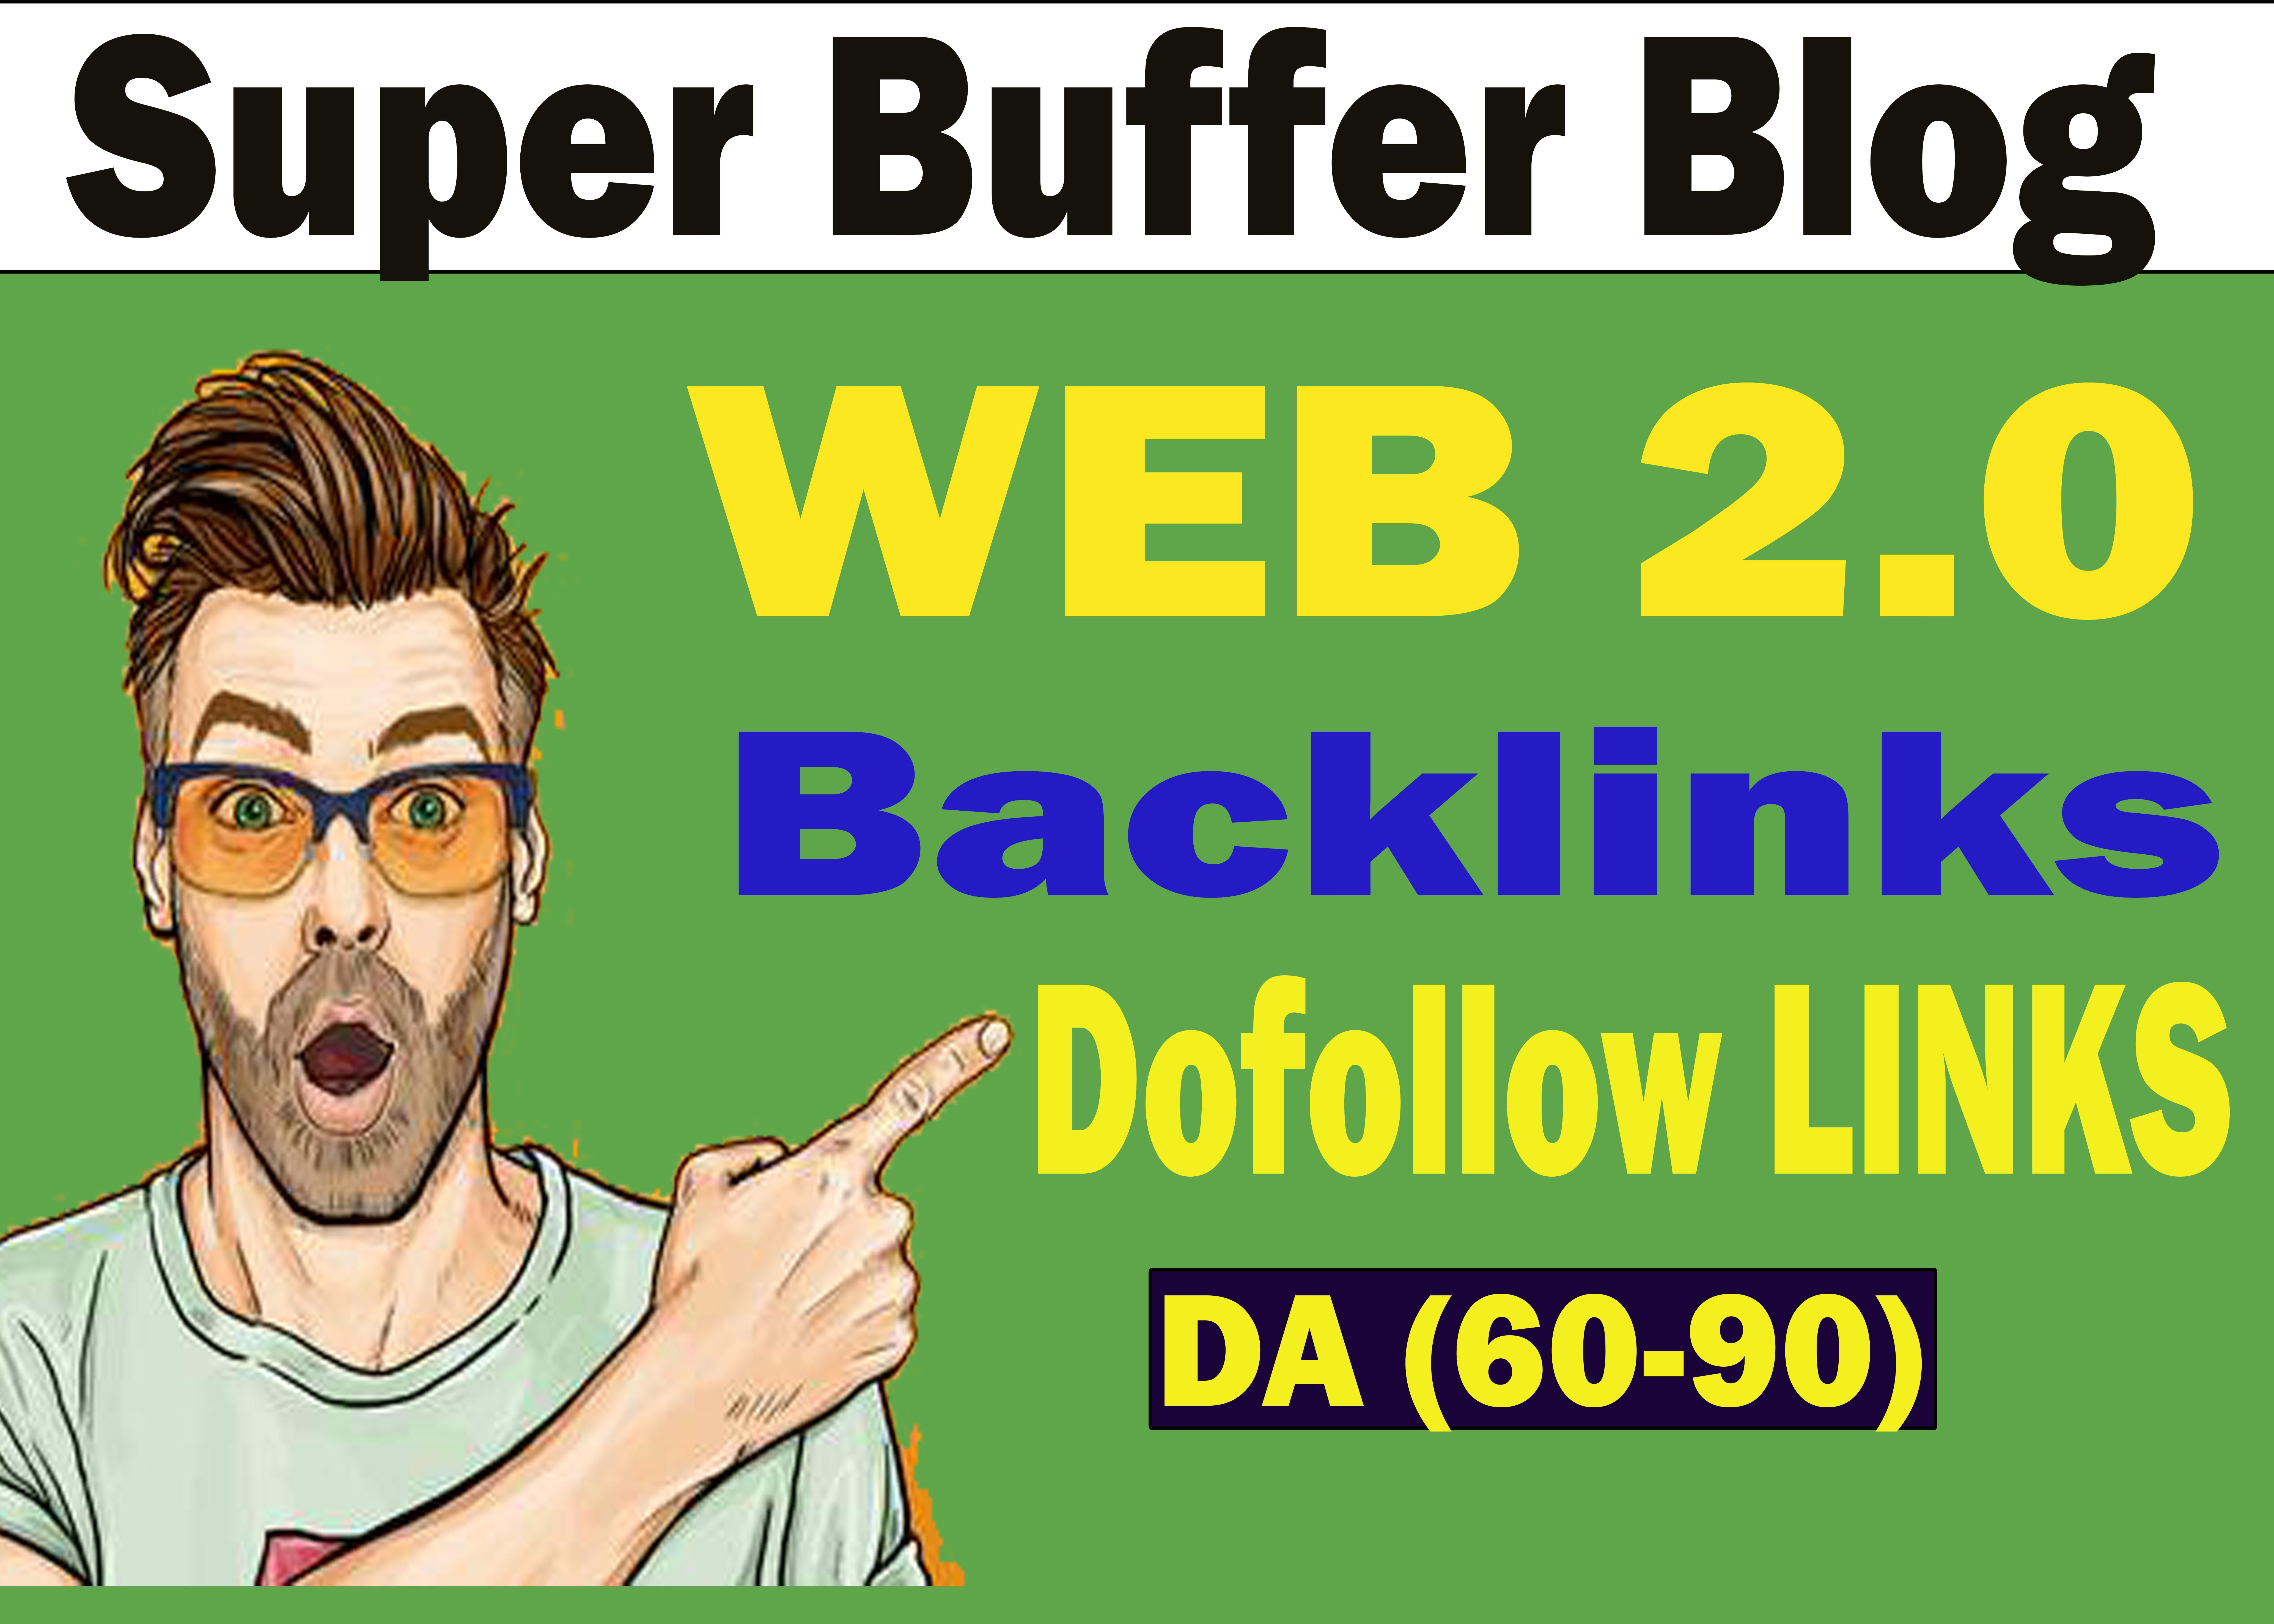 Create 30+ super Buffer blog Web2.0 Dofollow Backlinks for SEO ranking